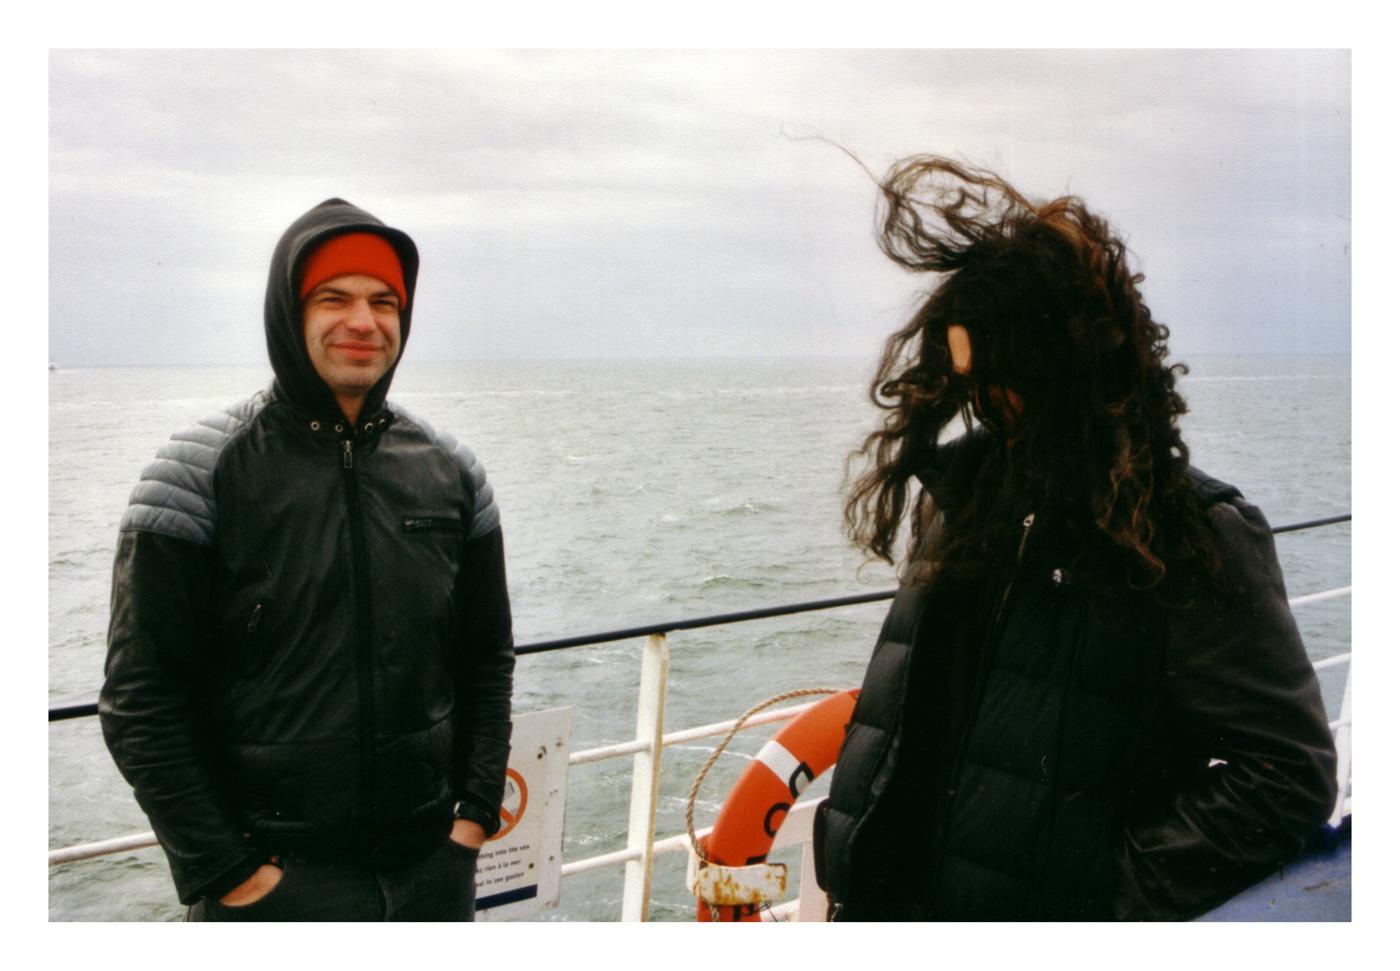 Joe Preston & SOMA on a Danish ferry 2003